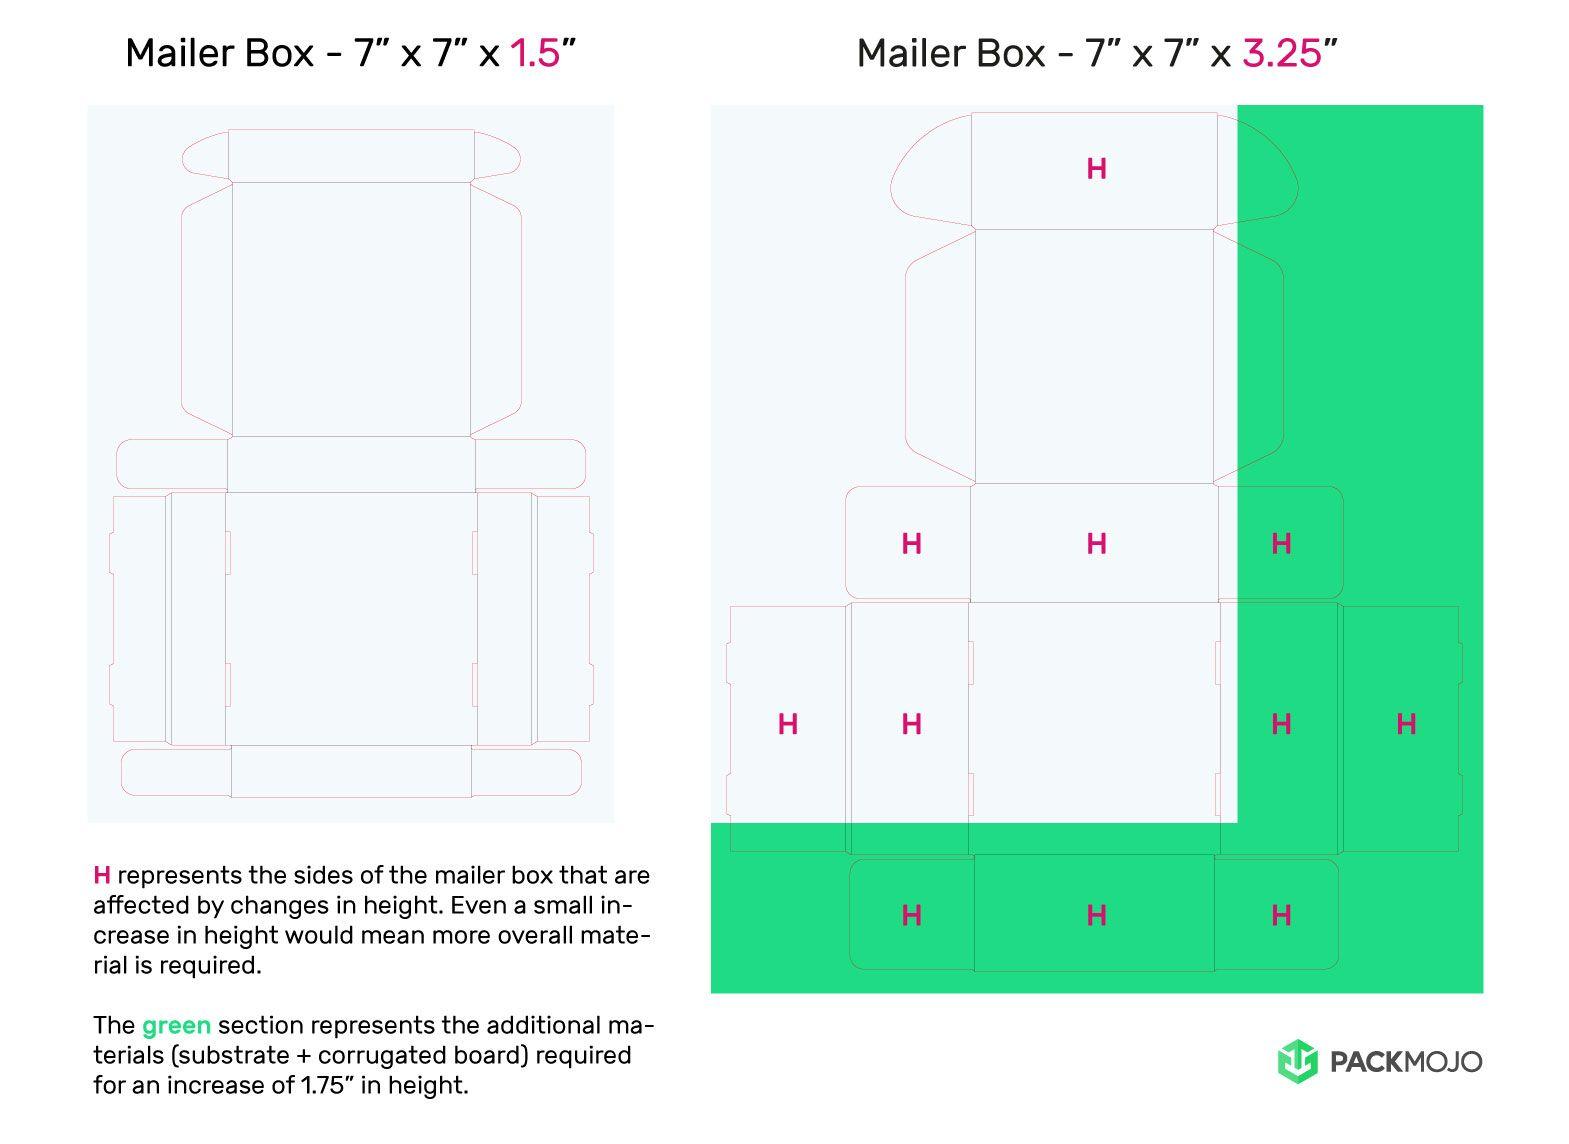 Mailer Box Height Increase Comparison Mockup